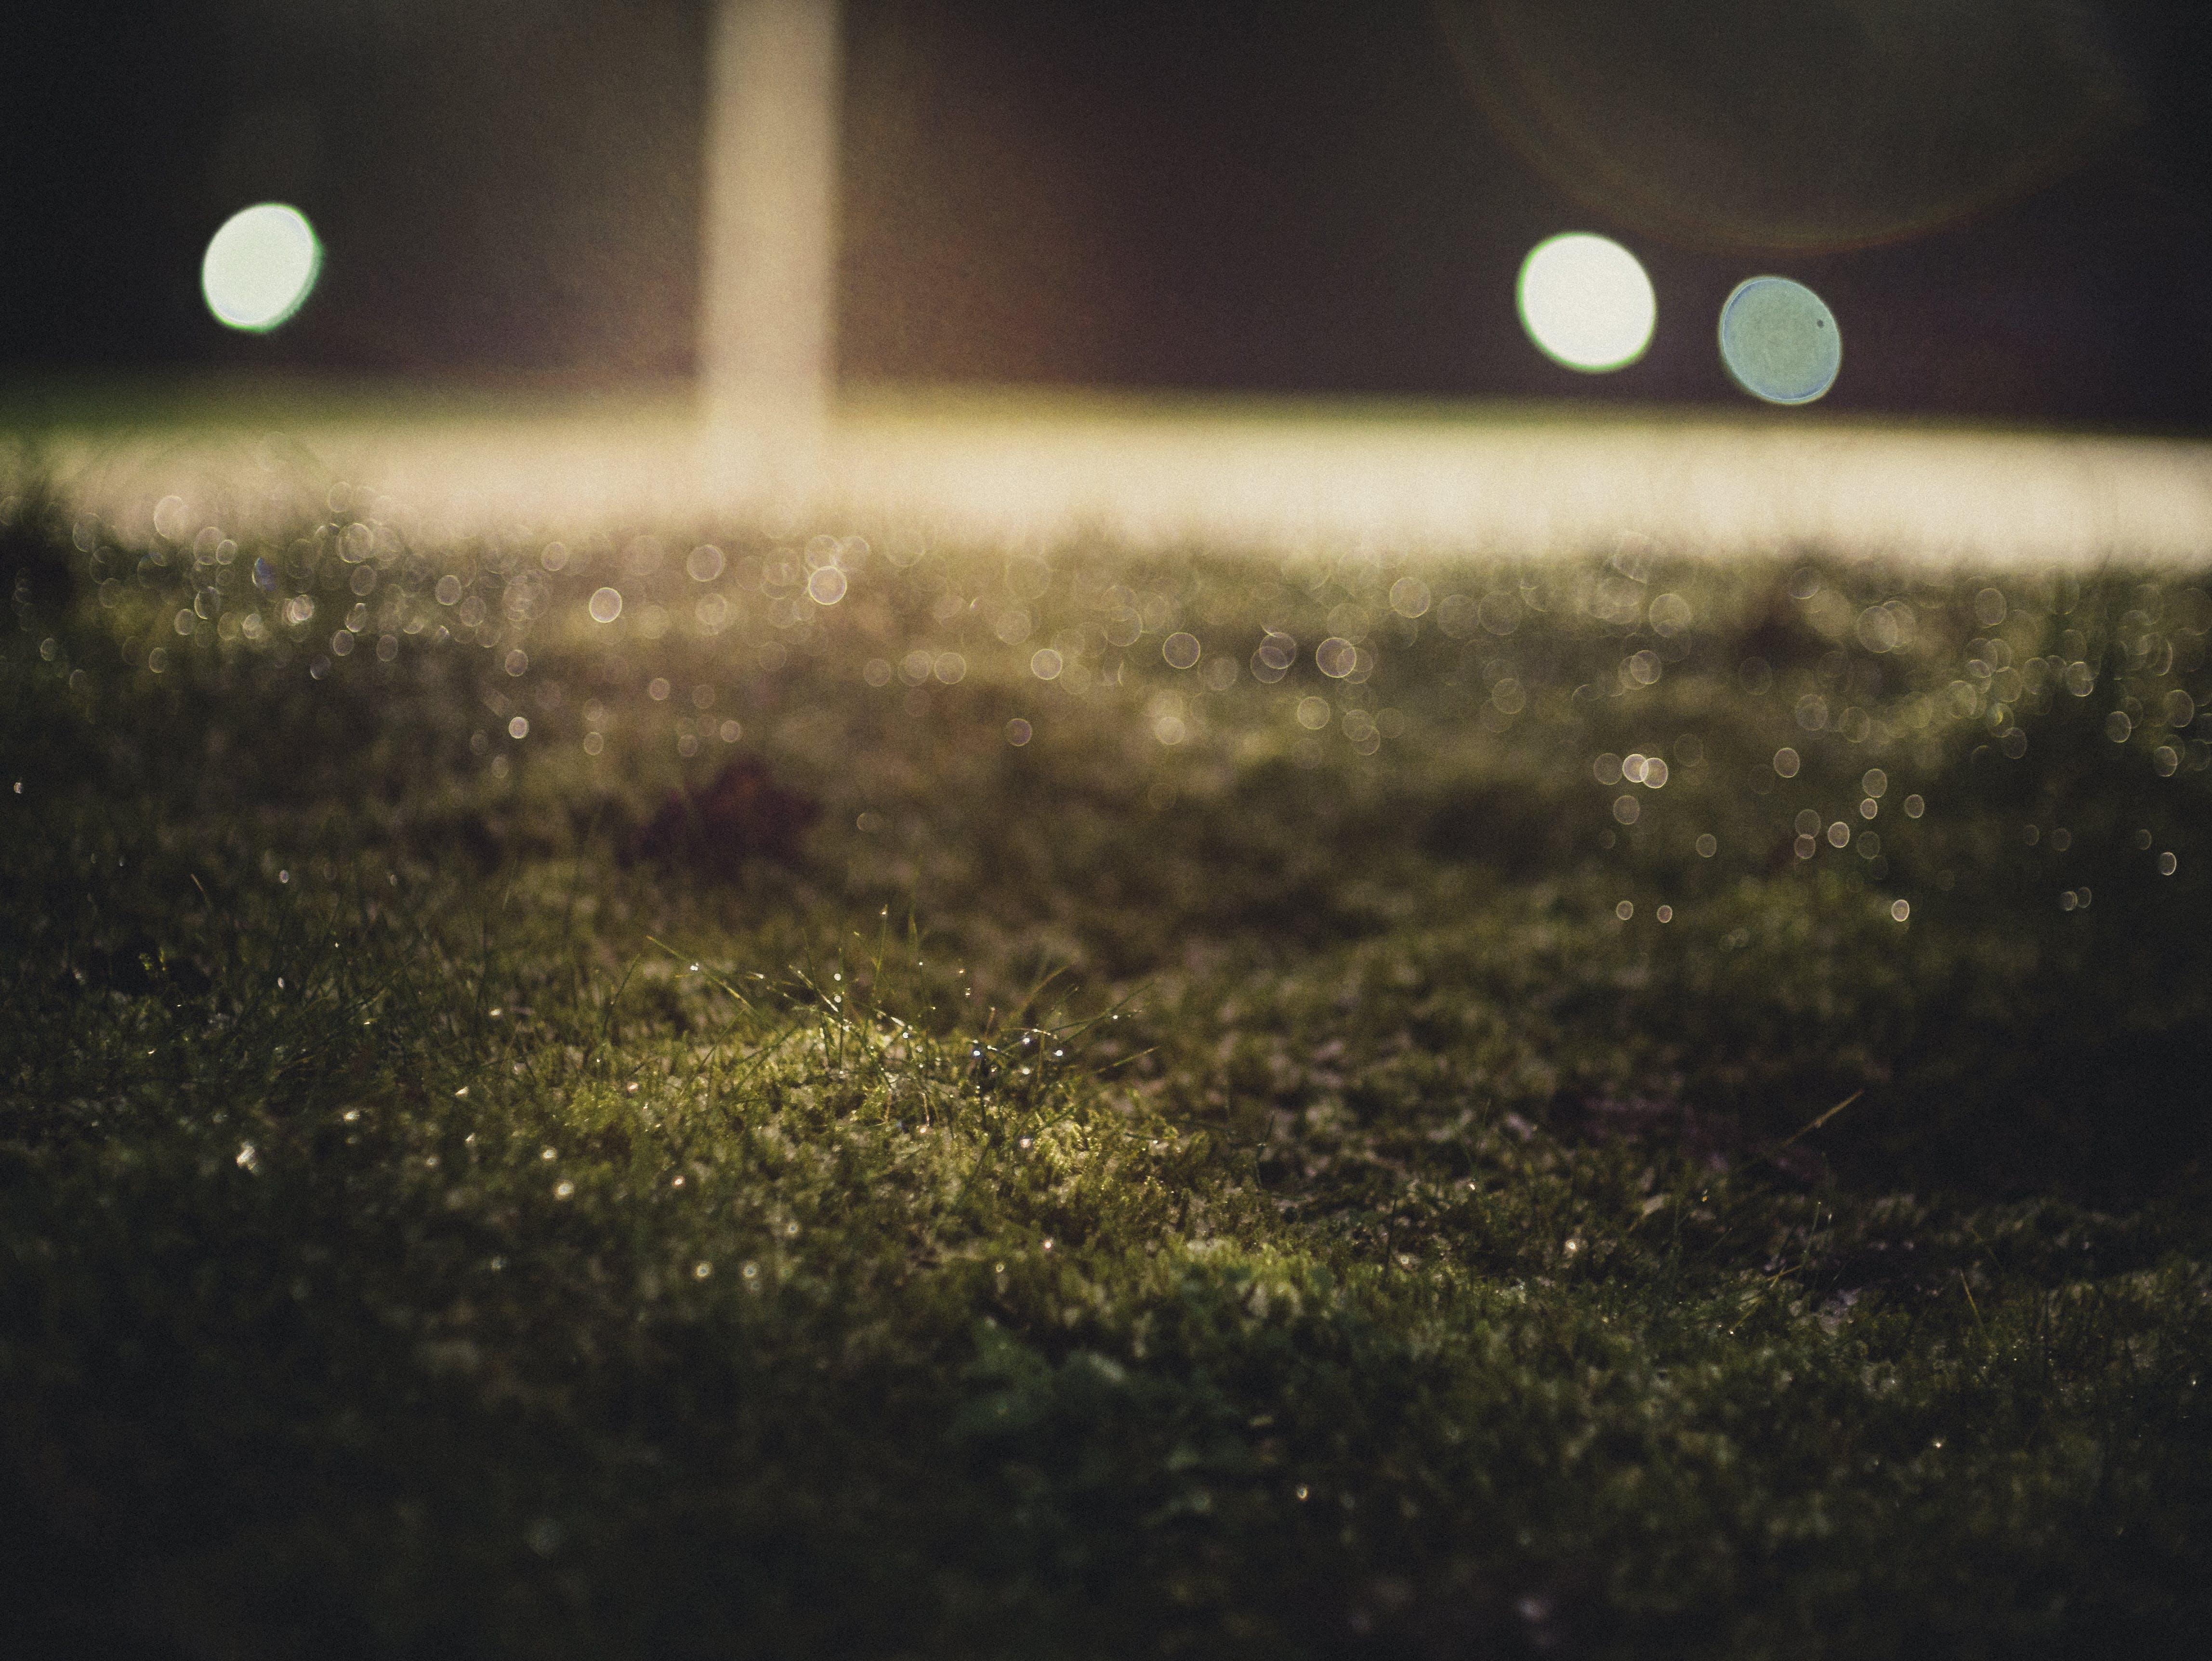 Free stock photo of grass, blur, bokeh, illuminated